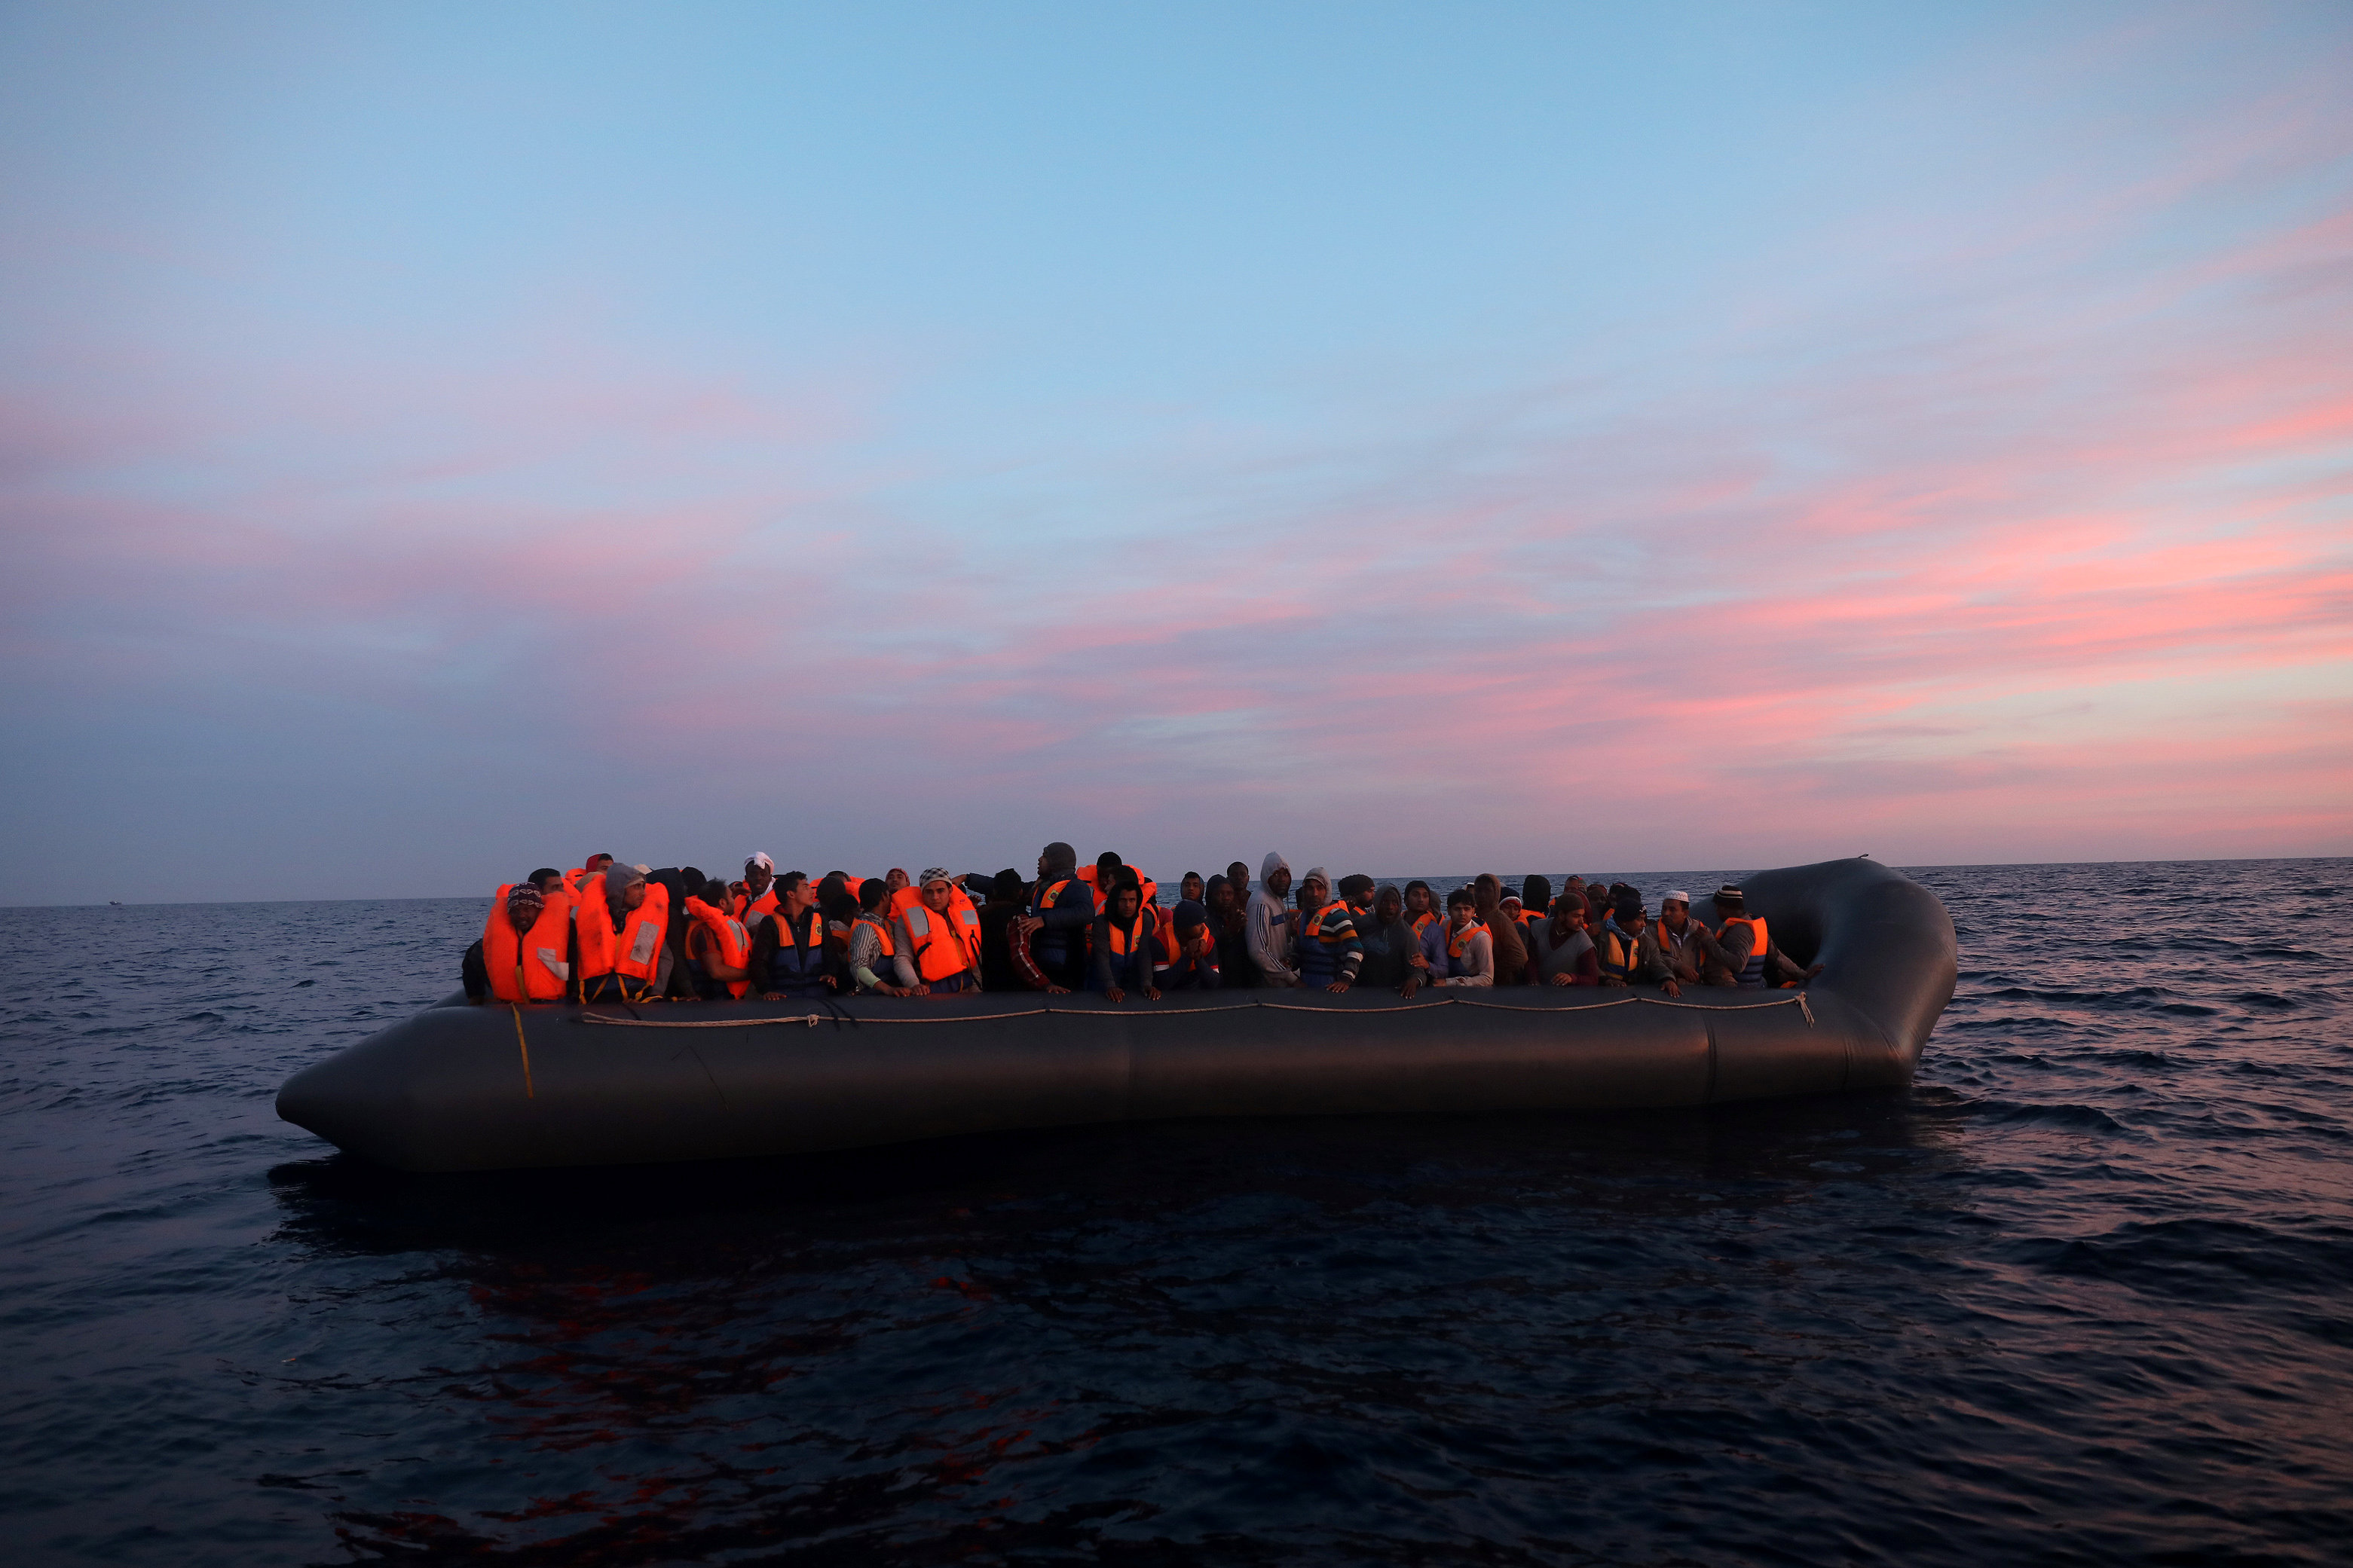 Photo of المهاجرون: مصير مجهول بعد قرار داخلية الوفاق